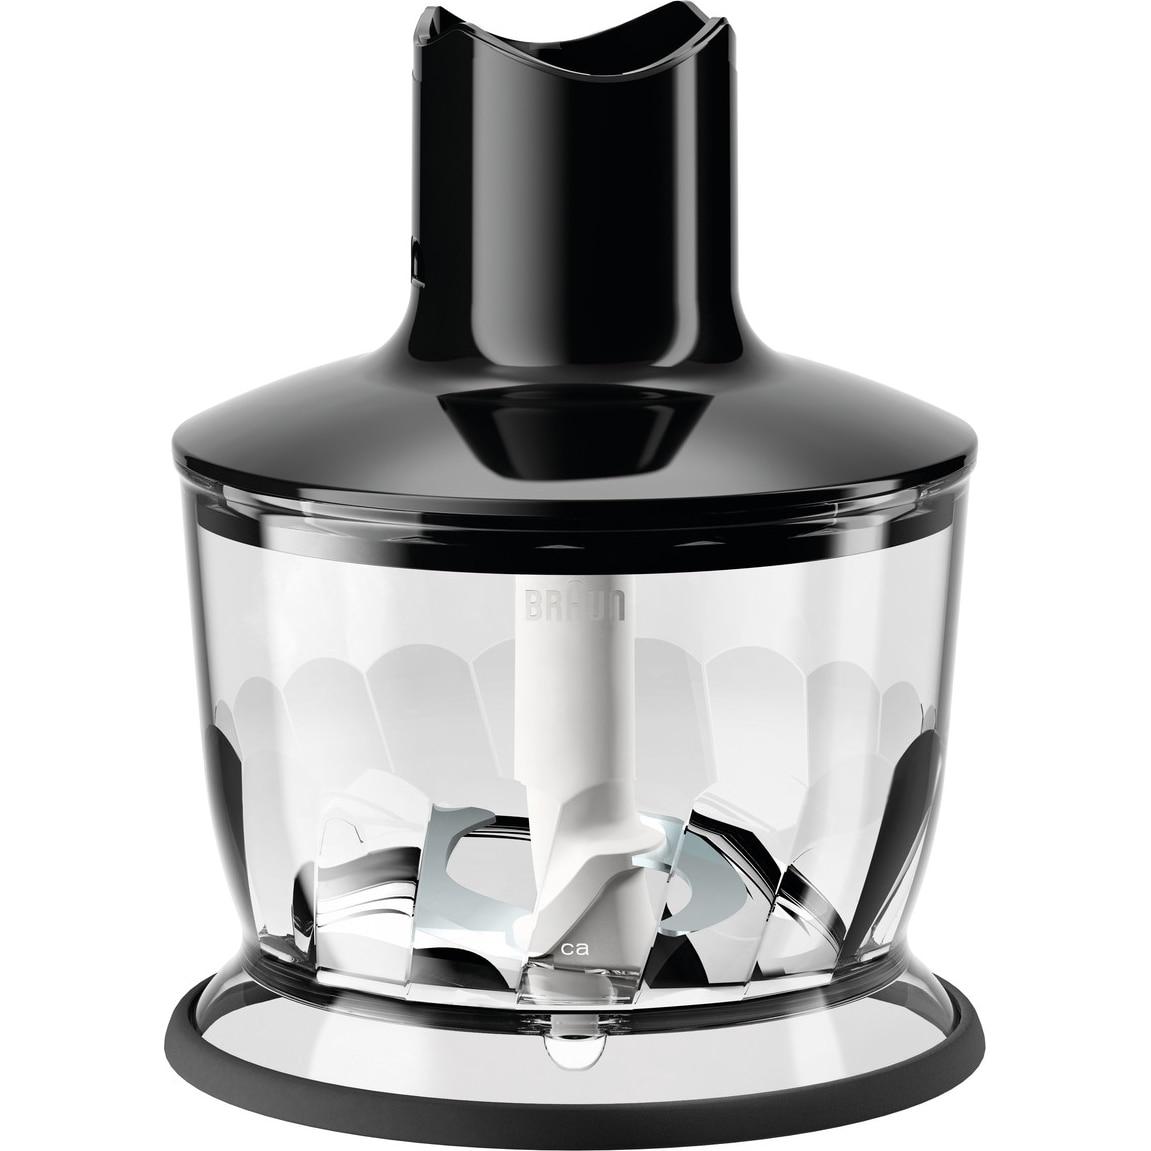 Fotografie Tocator pentru mixer vertical Braun, MQ30BK, 500 ml, Sistem EasyClick, Negru